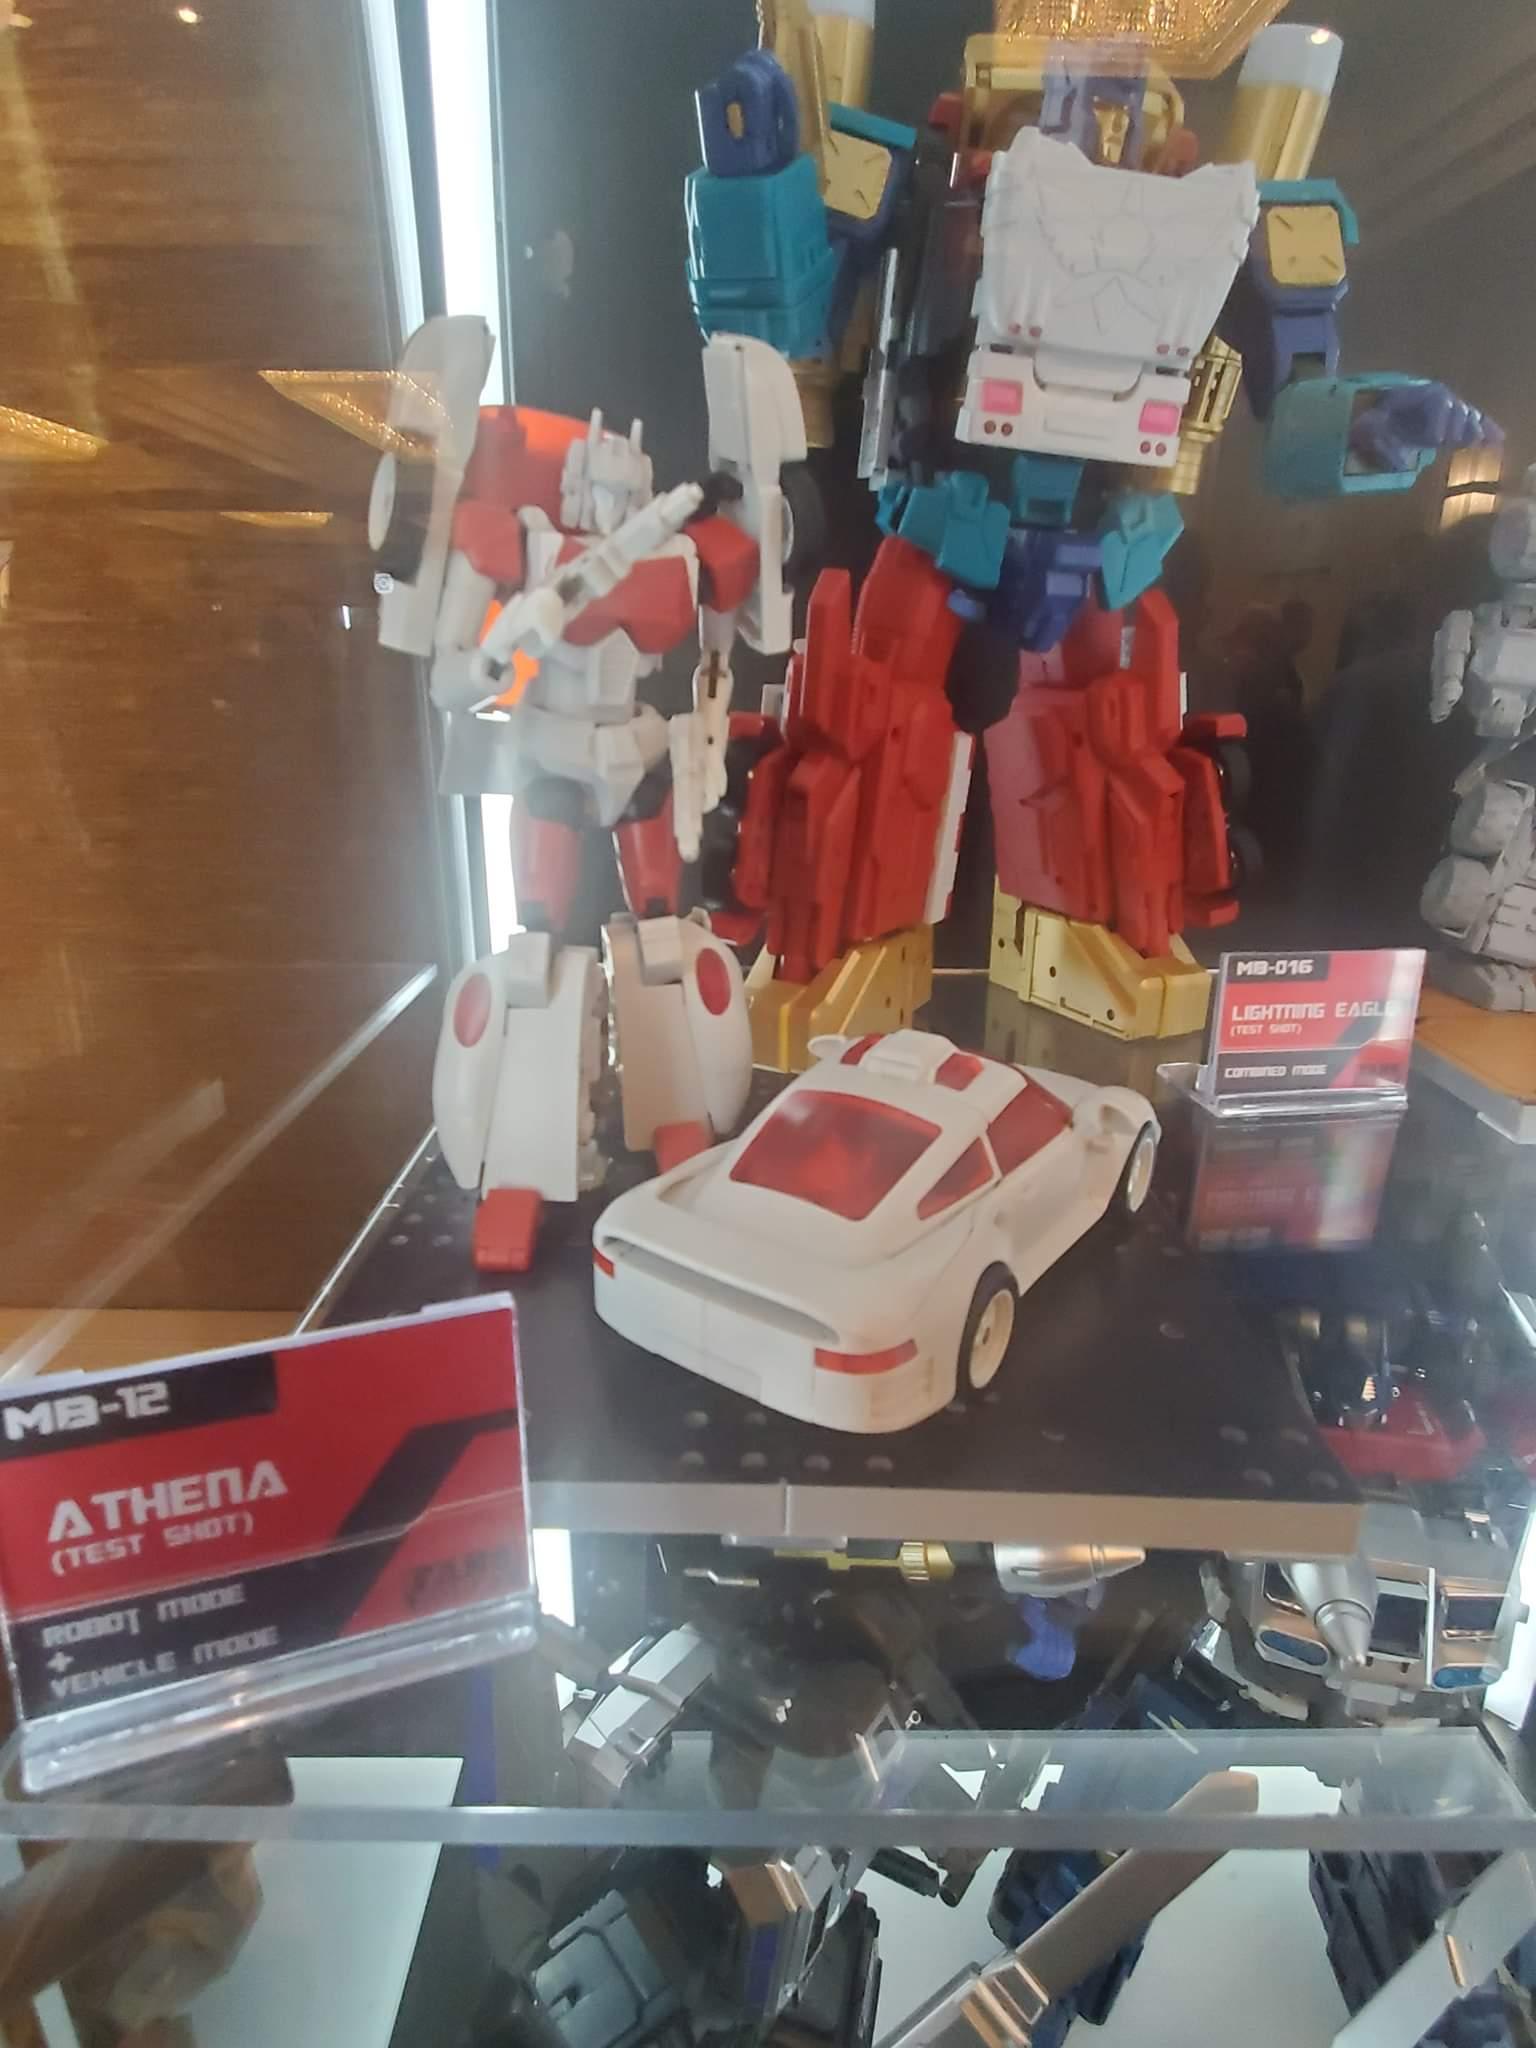 [FansHobby] Produit Tiers - MB-12 Athena (aka Minerva|Nightbeat/Veilleur) et MB-13 Ace Hitter (aka Goshooter|Siren/Sirène) [TF Masterforce] ZJ4ba7CJ_o